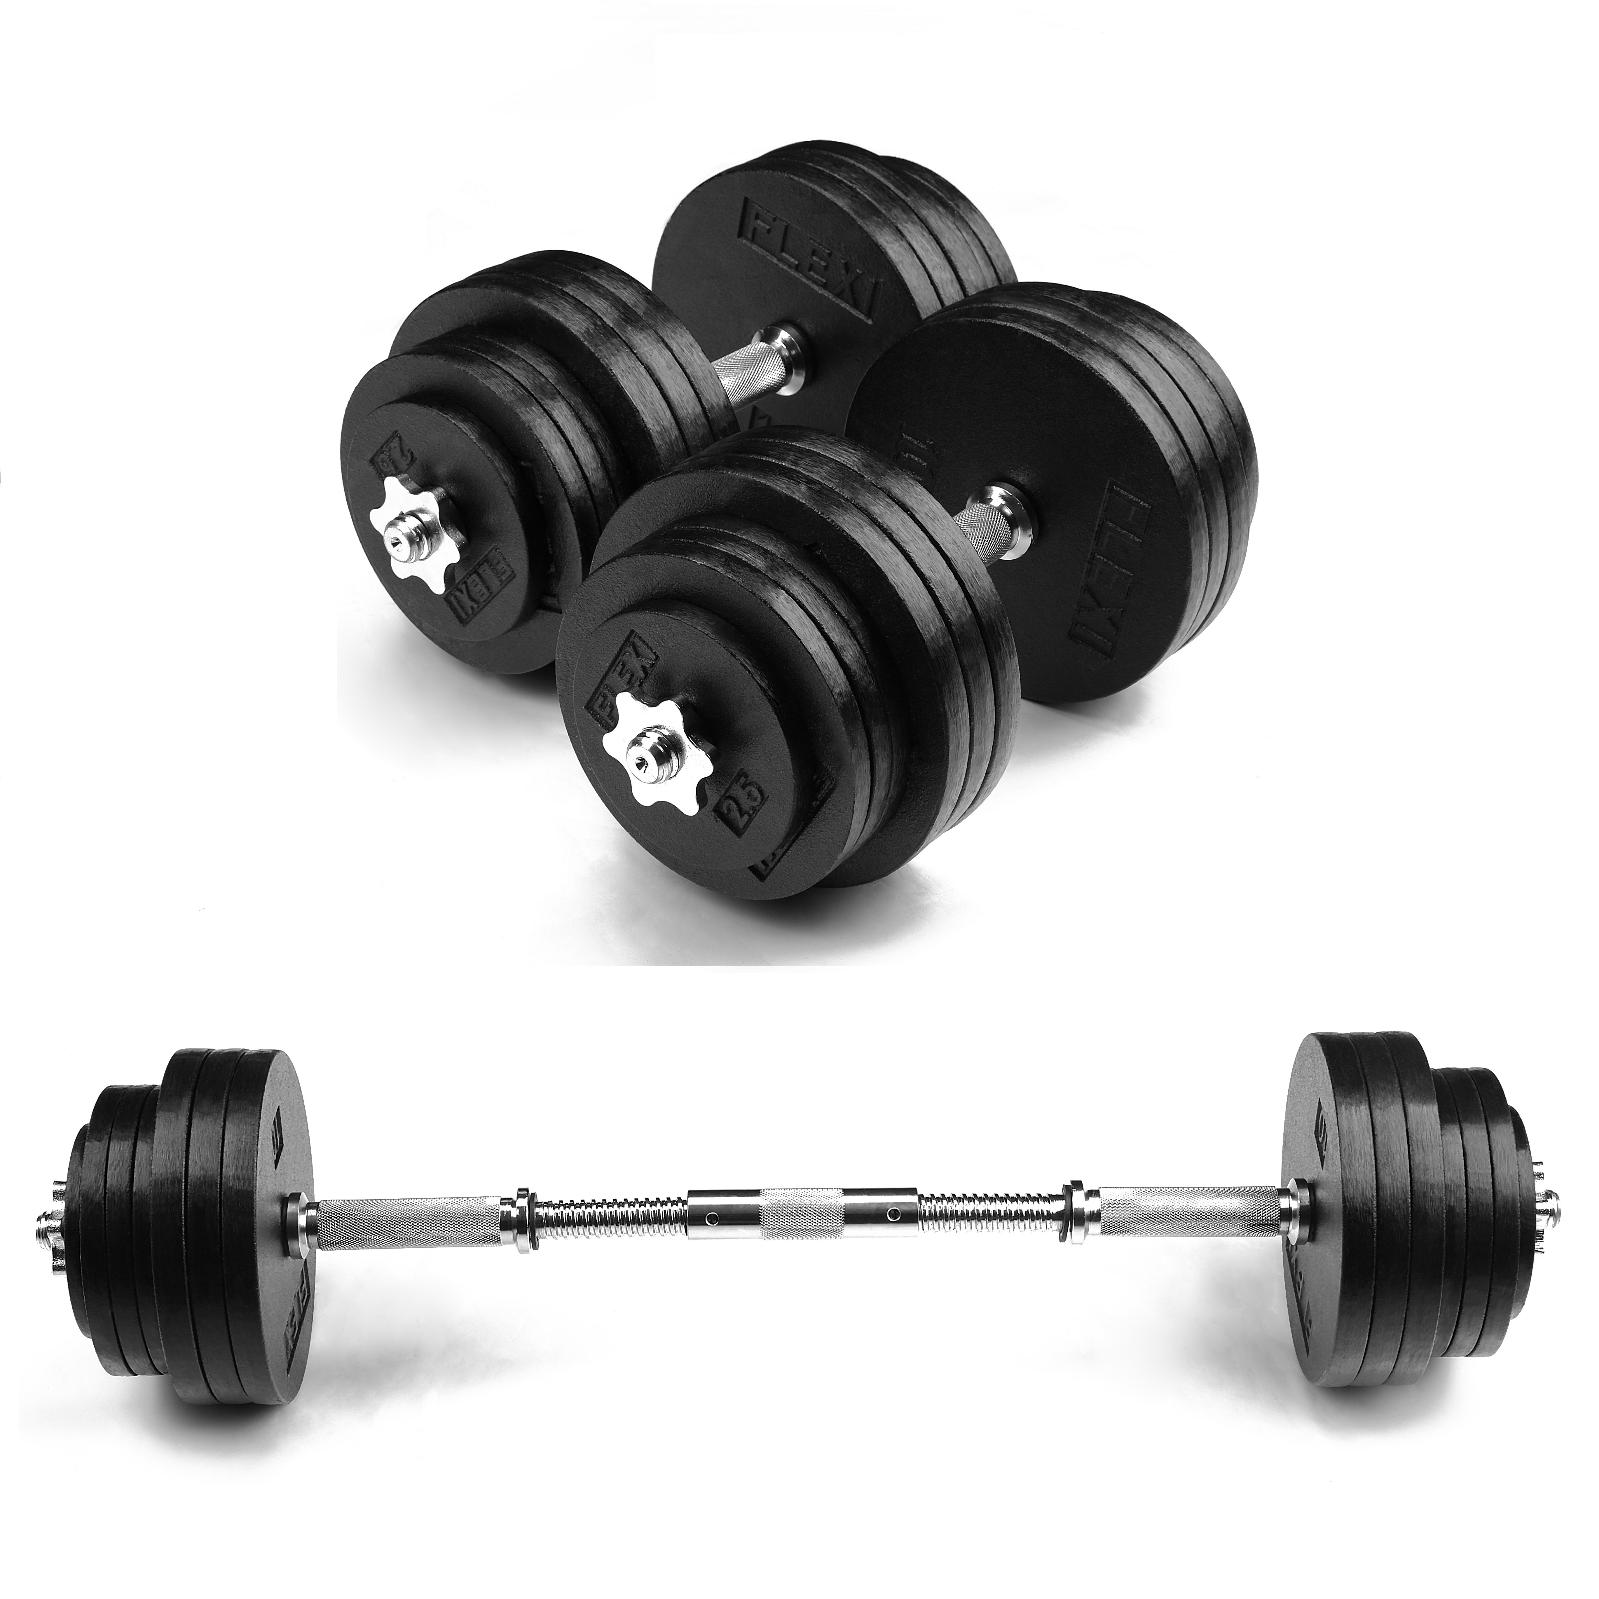 Adjustable 200 Lb Dumbbells: FlexiMuscle 200LB Adjustable Cast Iron Dumbbells Set